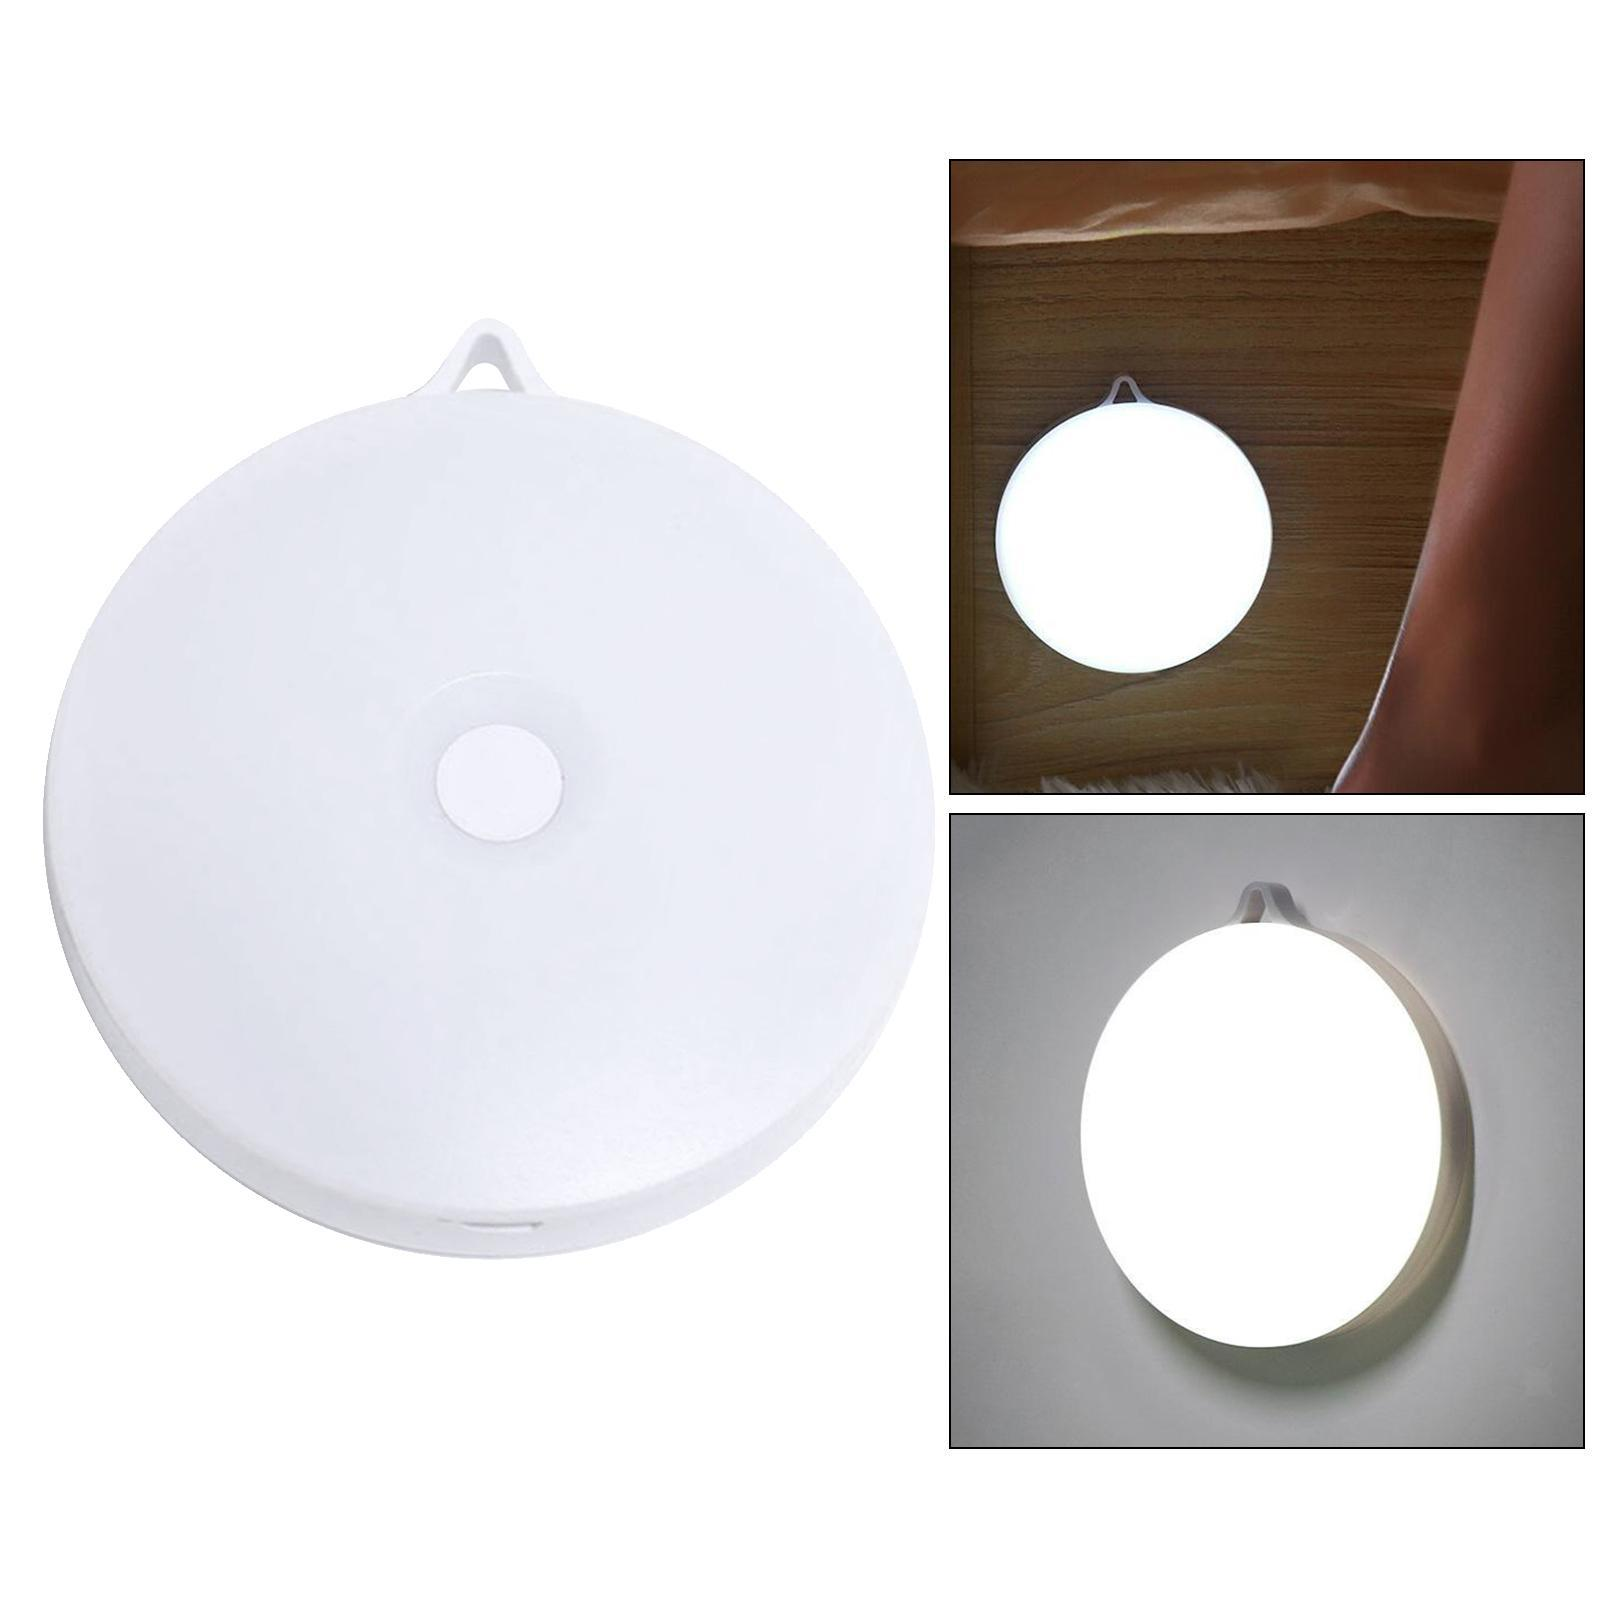 miniatura 25 - Luce notturna a LED per camera da letto ricaricabile USB per Hotel con sensore